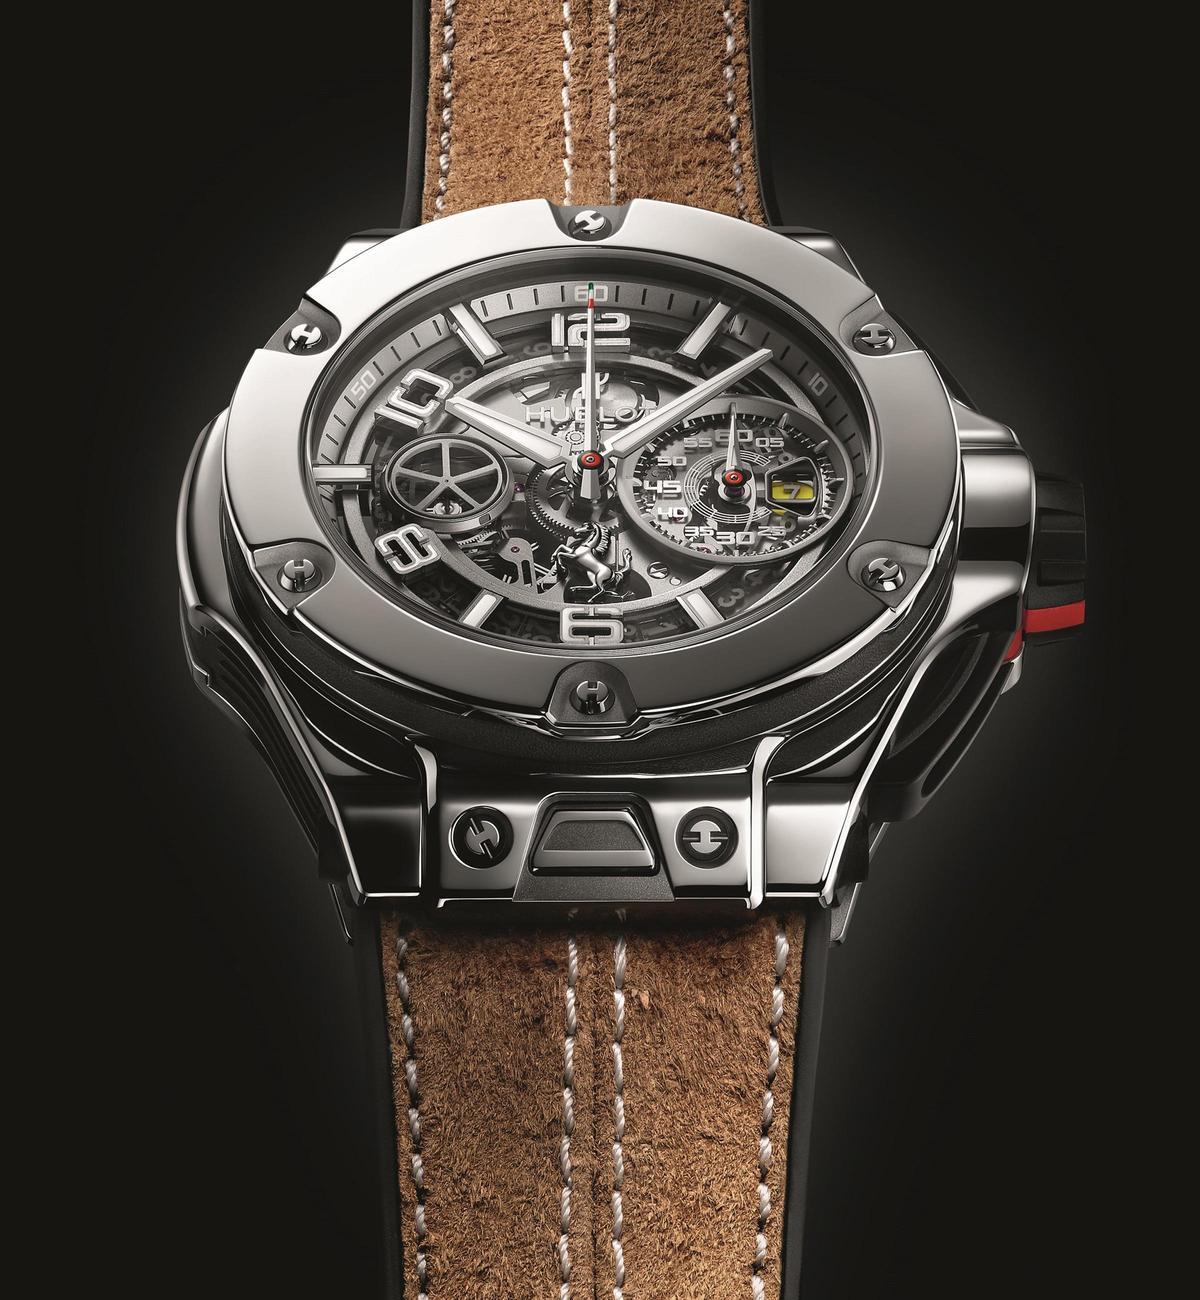 Big Bang 法拉利 1000 GP紀念錶,45mm白金錶殼,搭配賽車專用皮革手套內襯黑色天然橡膠錶帶,限量20只,定價NT$1,635,000。